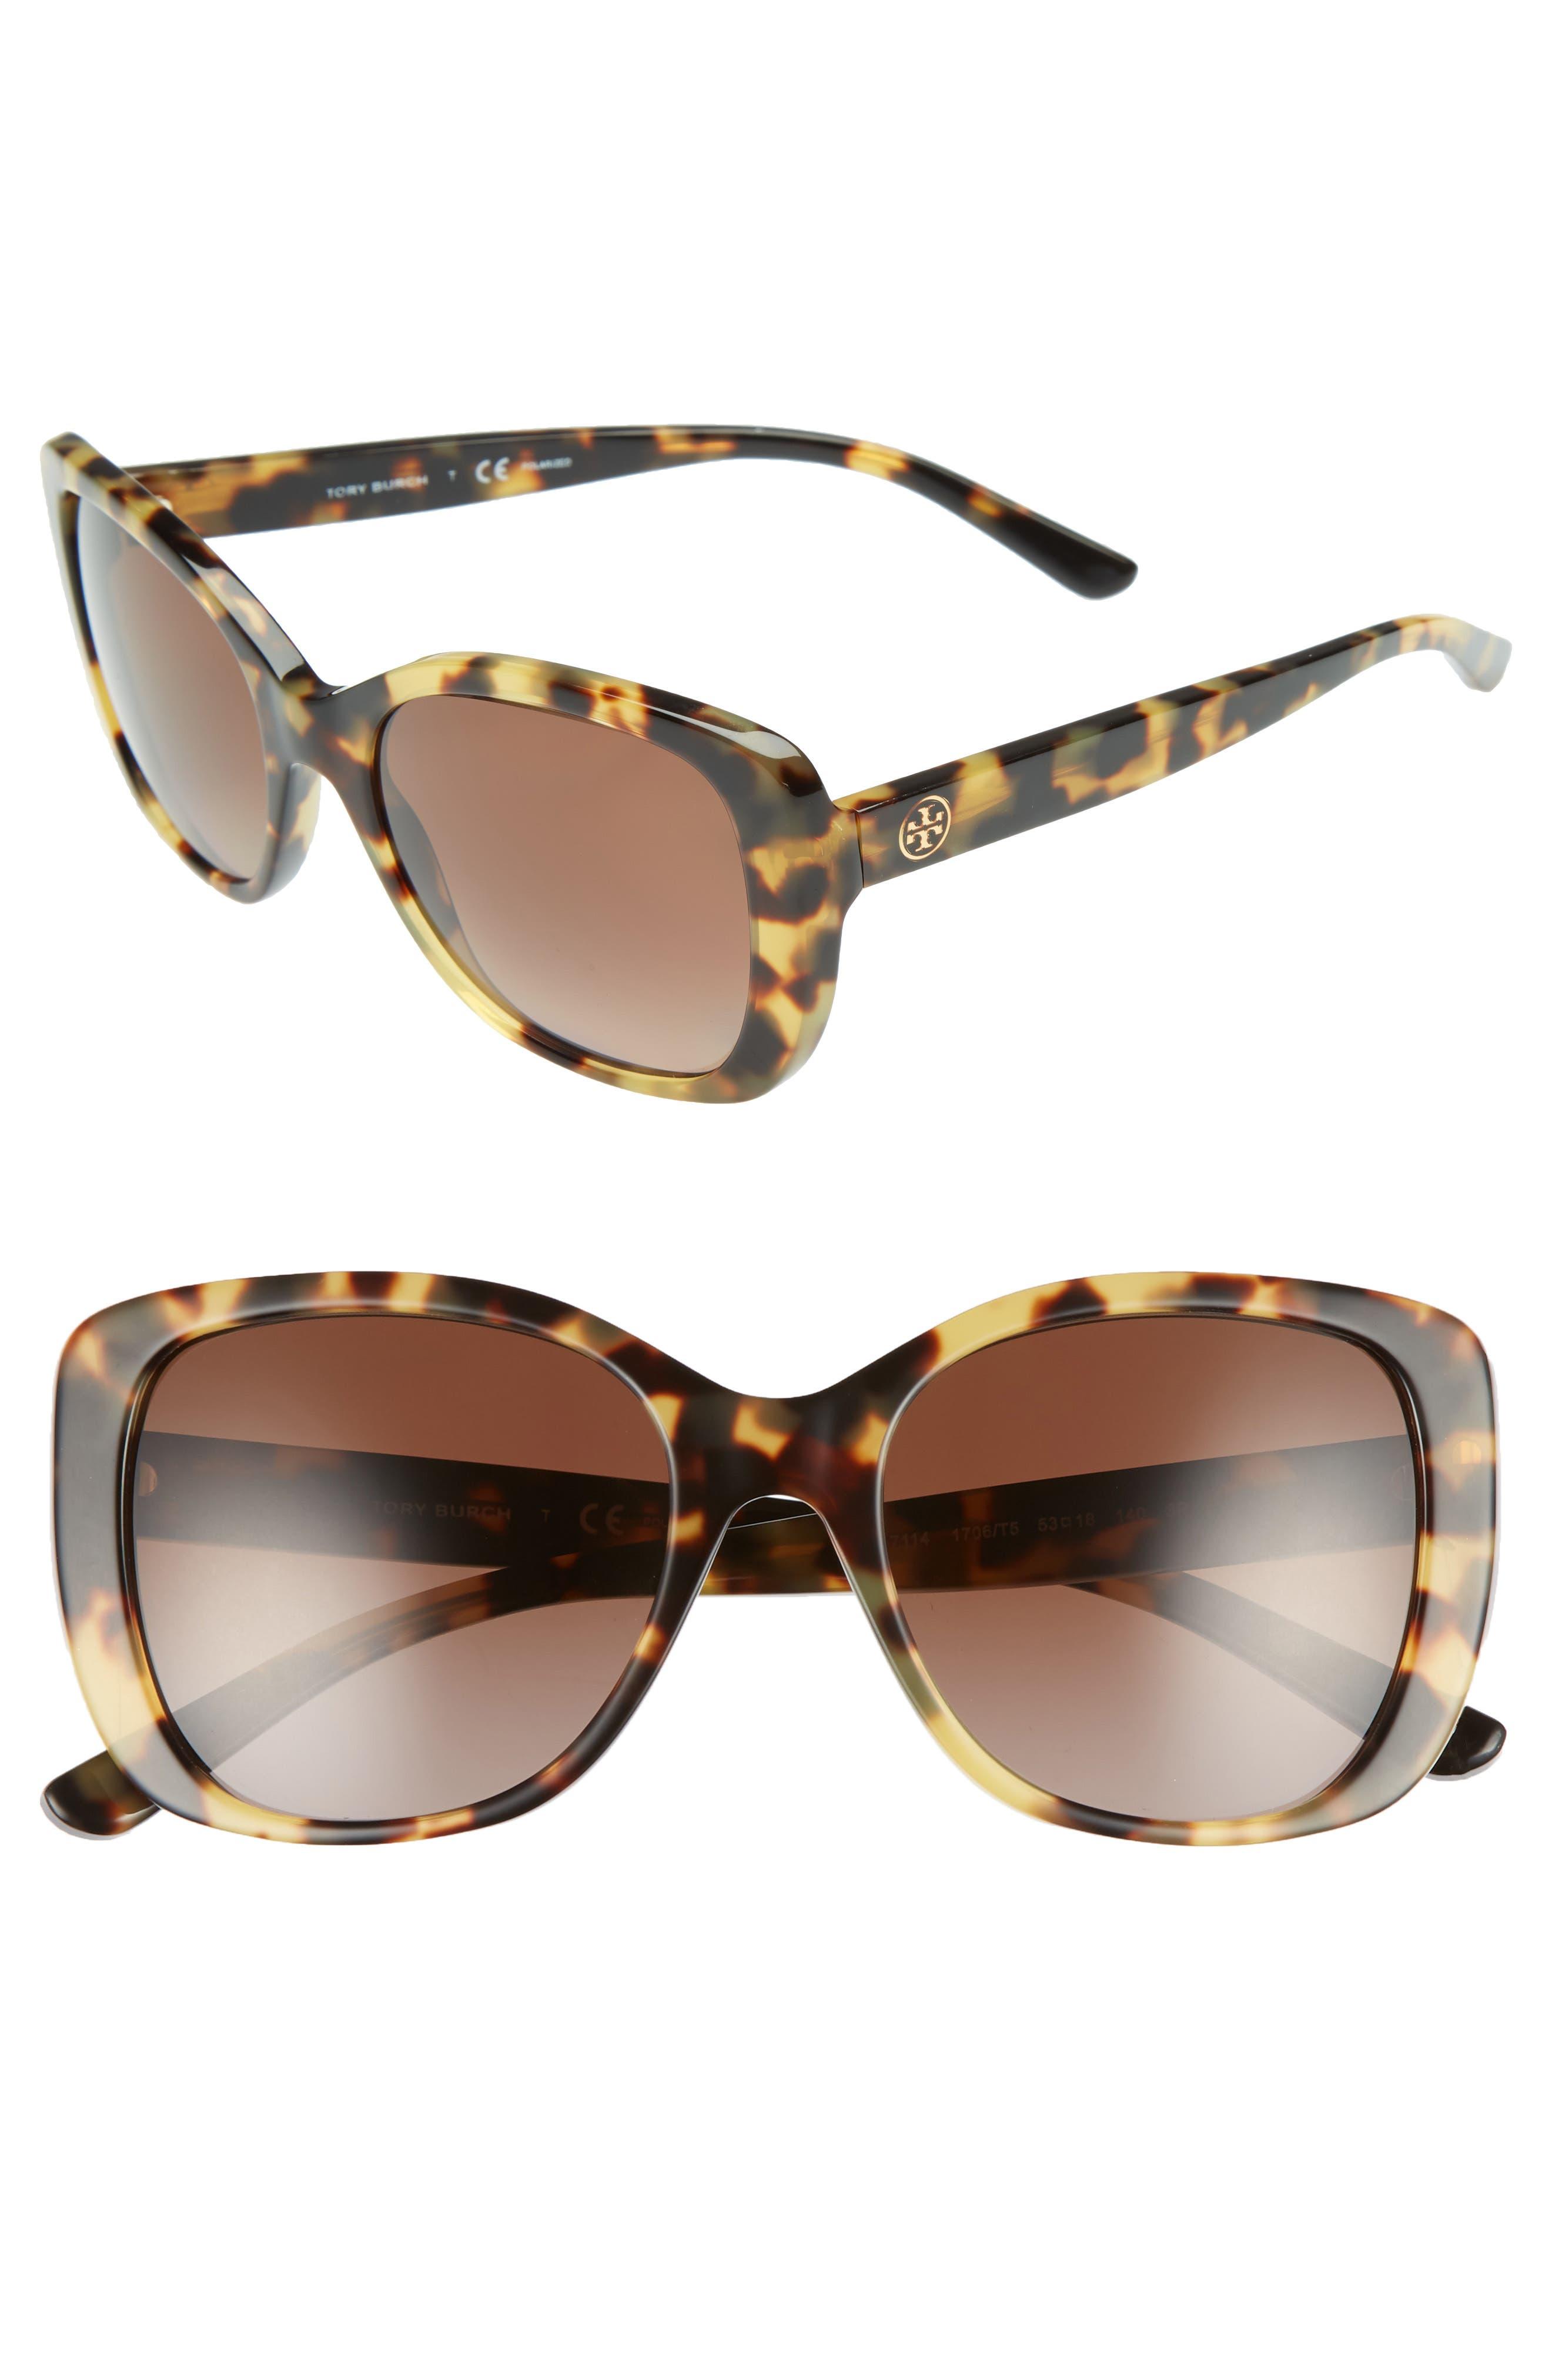 53mm Polarized Rectangle Sunglasses,                             Main thumbnail 1, color,                             Tokyo Tortoise Gradient